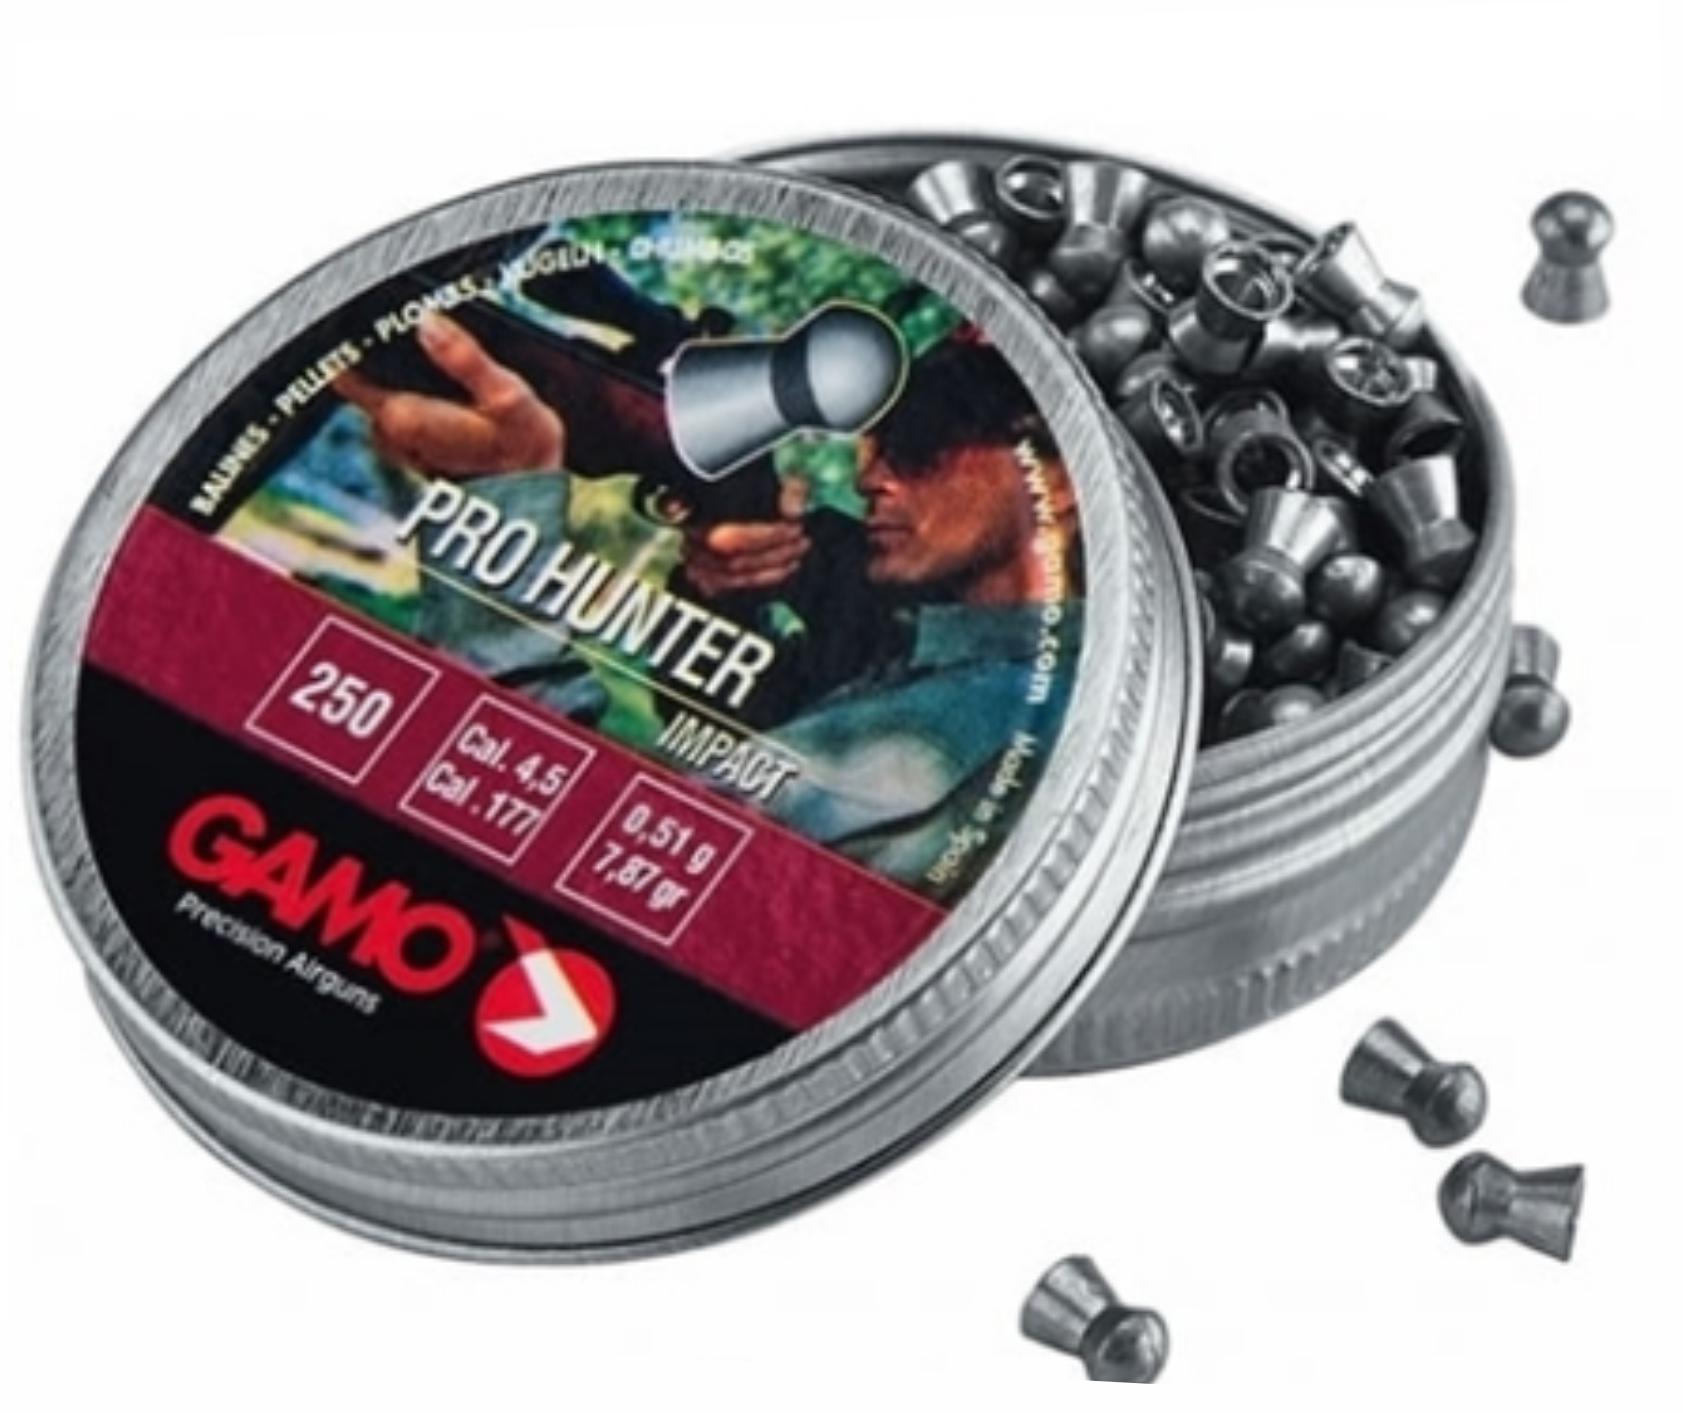 Chumbinho Gamo Pro Hunter 4.5mm - Latinha c/ 250 unidades